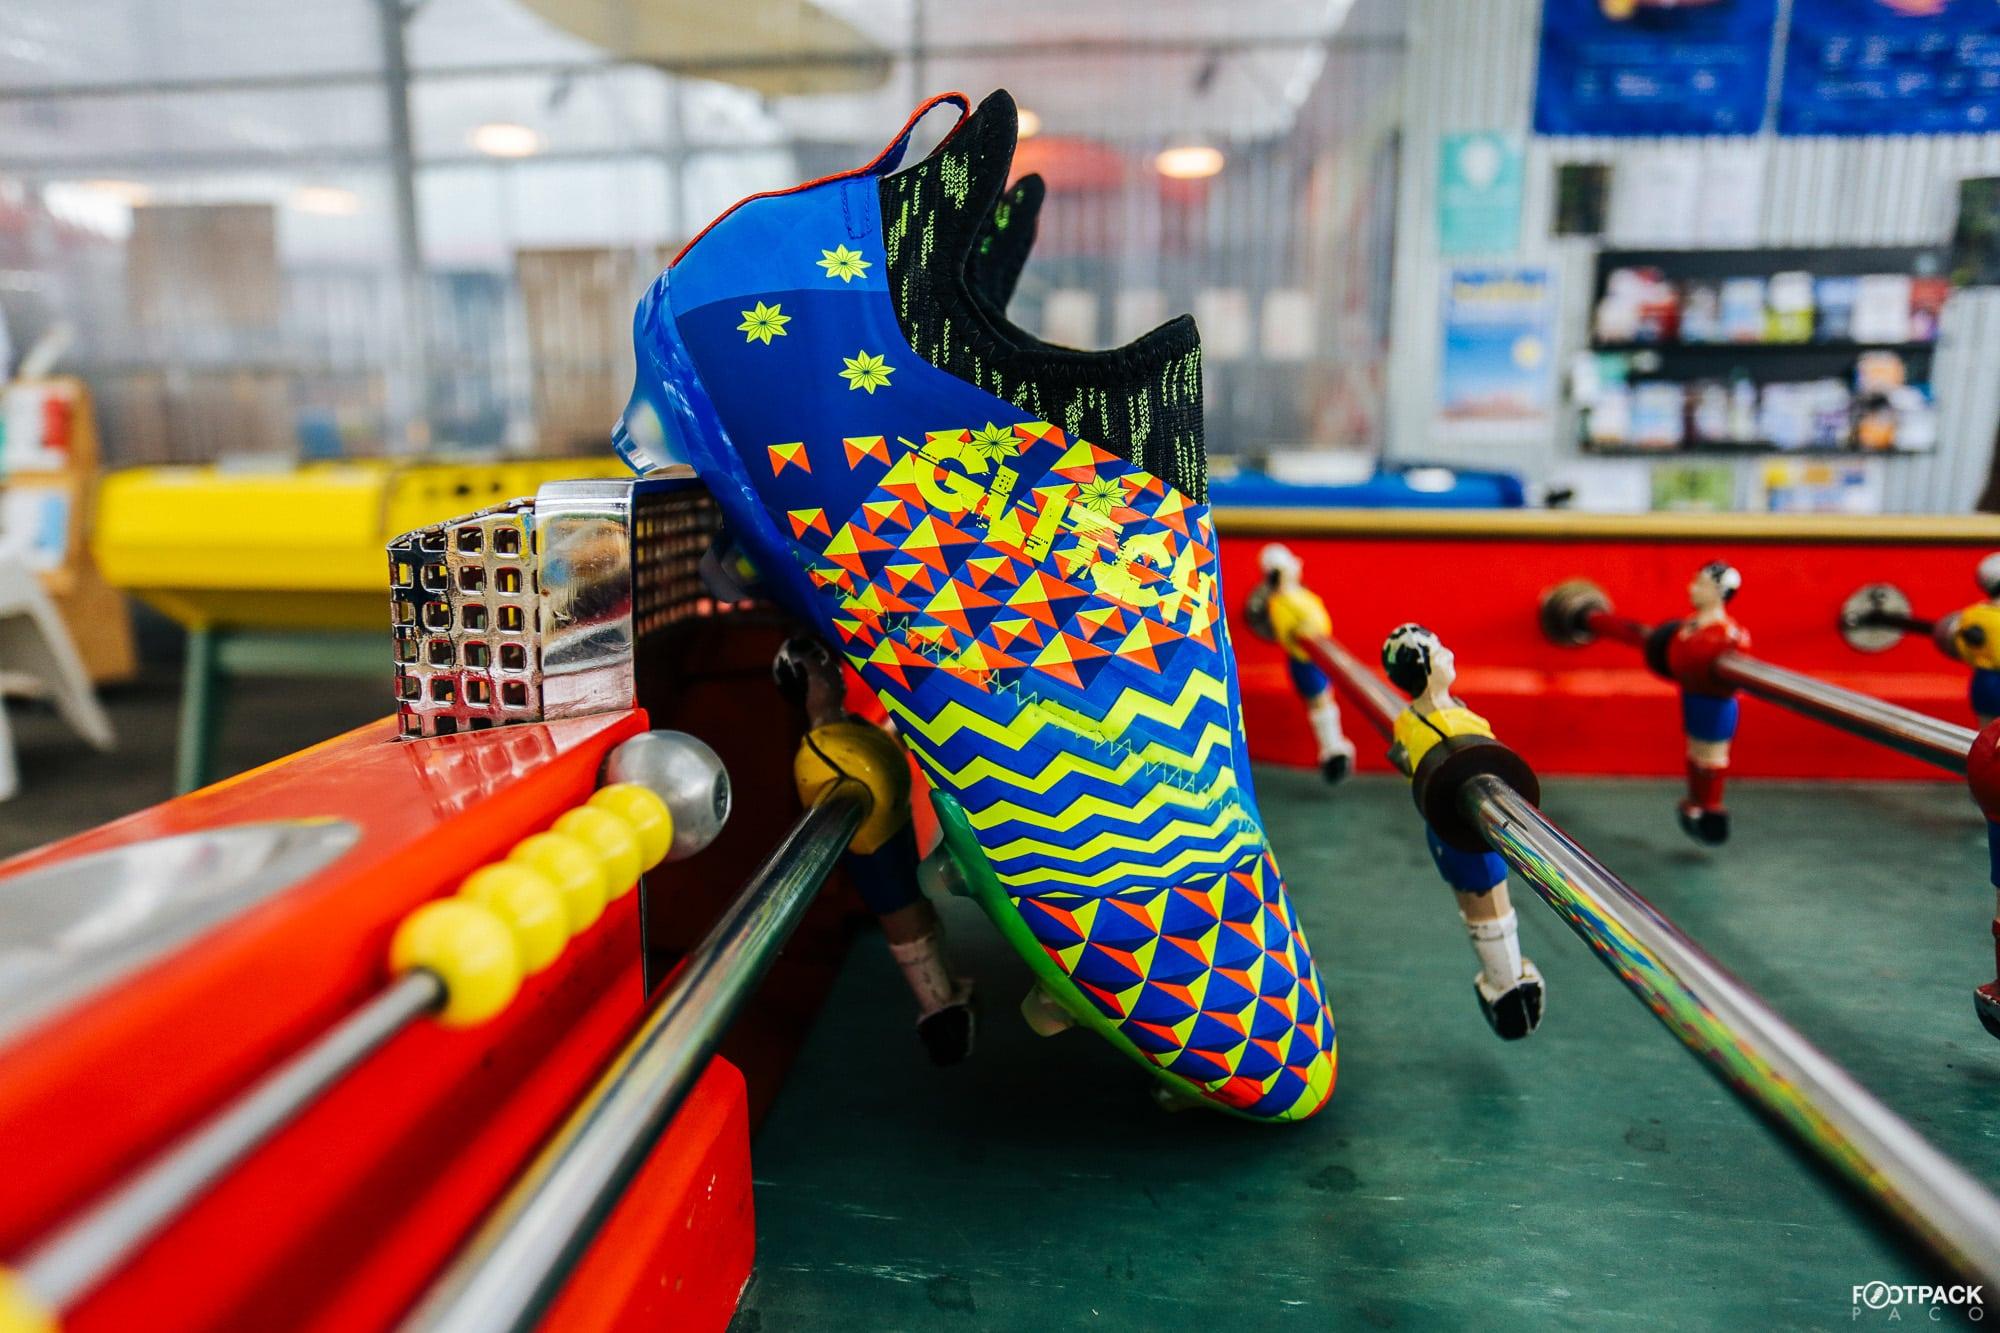 Chaussures-football-adidas-glitch-2-0-Russie-2018-juin-2018